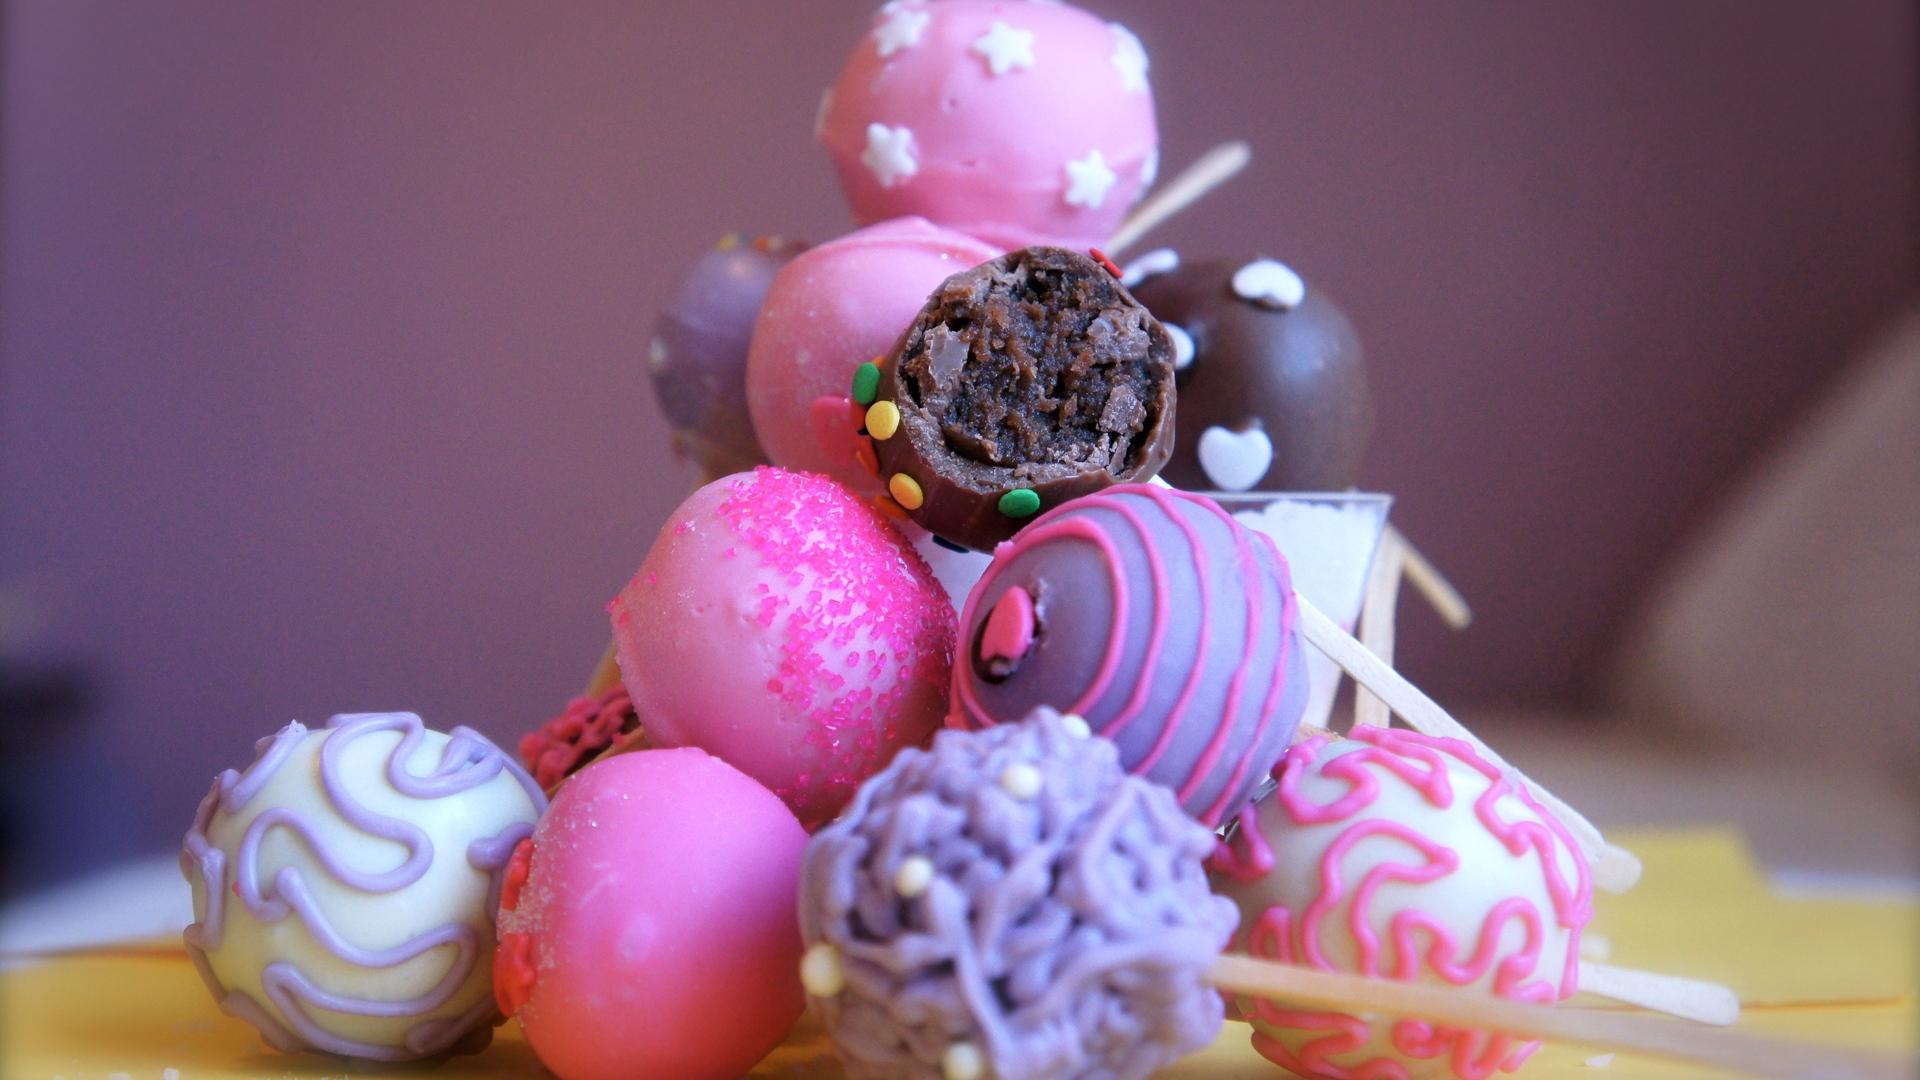 Сладости вкусняшки тортики фото слюнки текут (21шт) 9